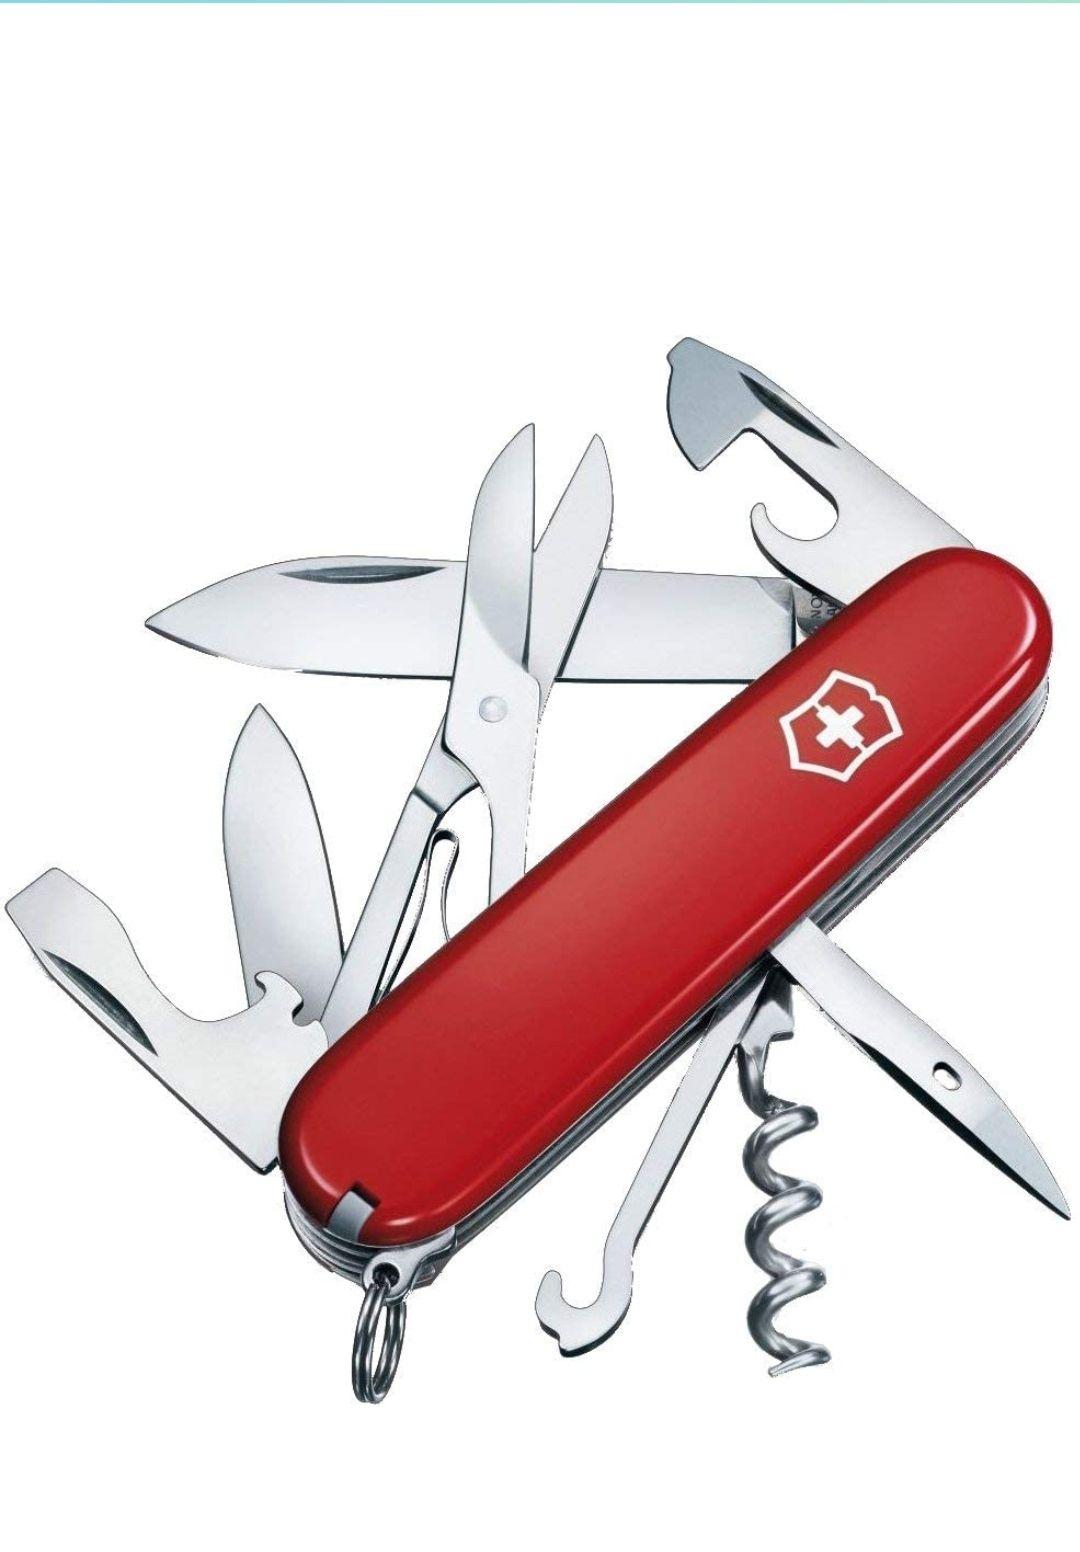 Couteau suisse Victorinox Climber